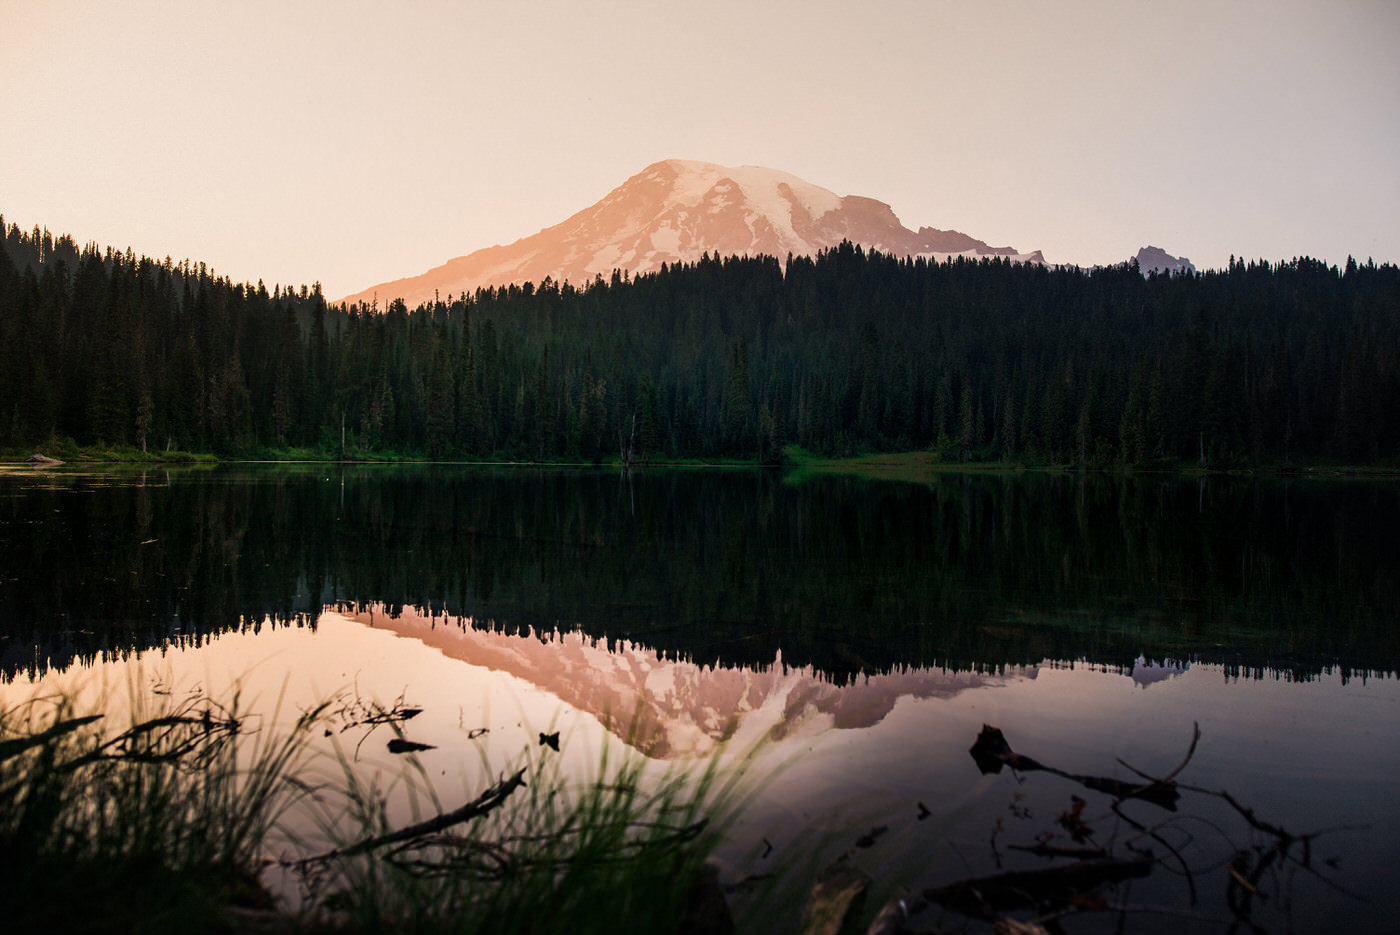 013-sunset-landscape-at-reflection-lake-in-mt-rainier-national-park.jpg